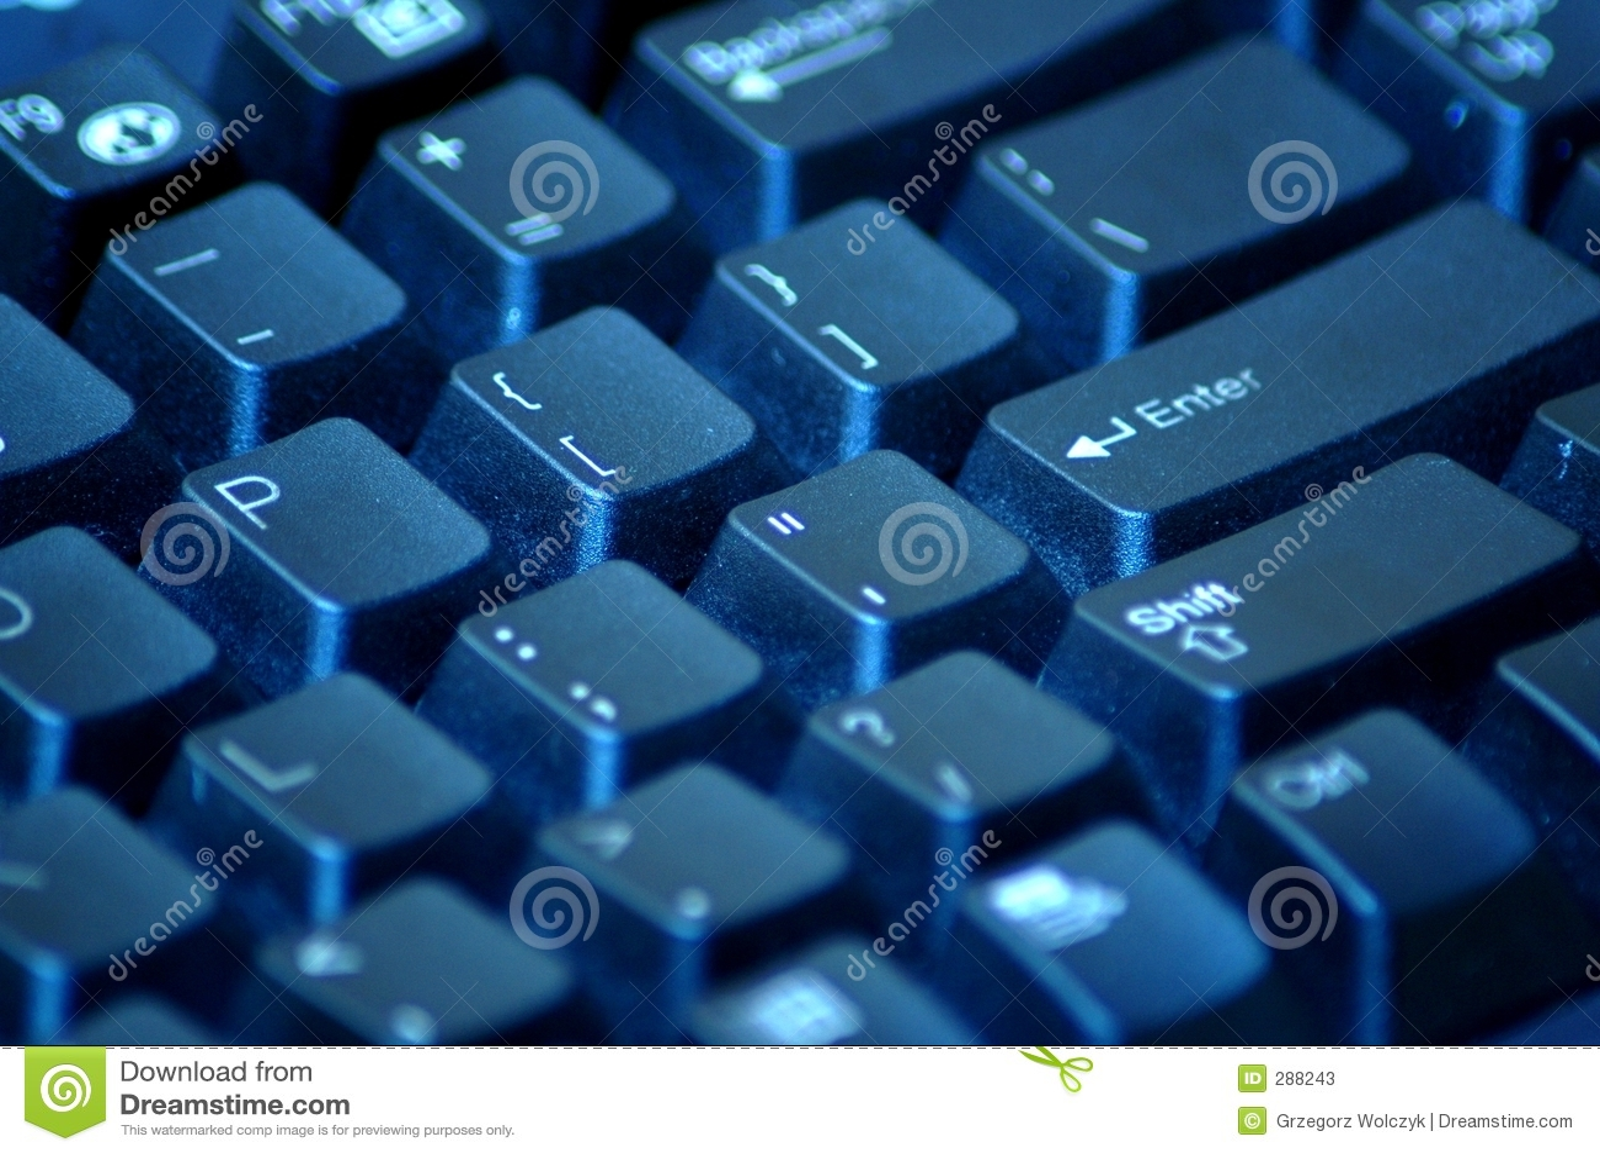 Keyboard_4